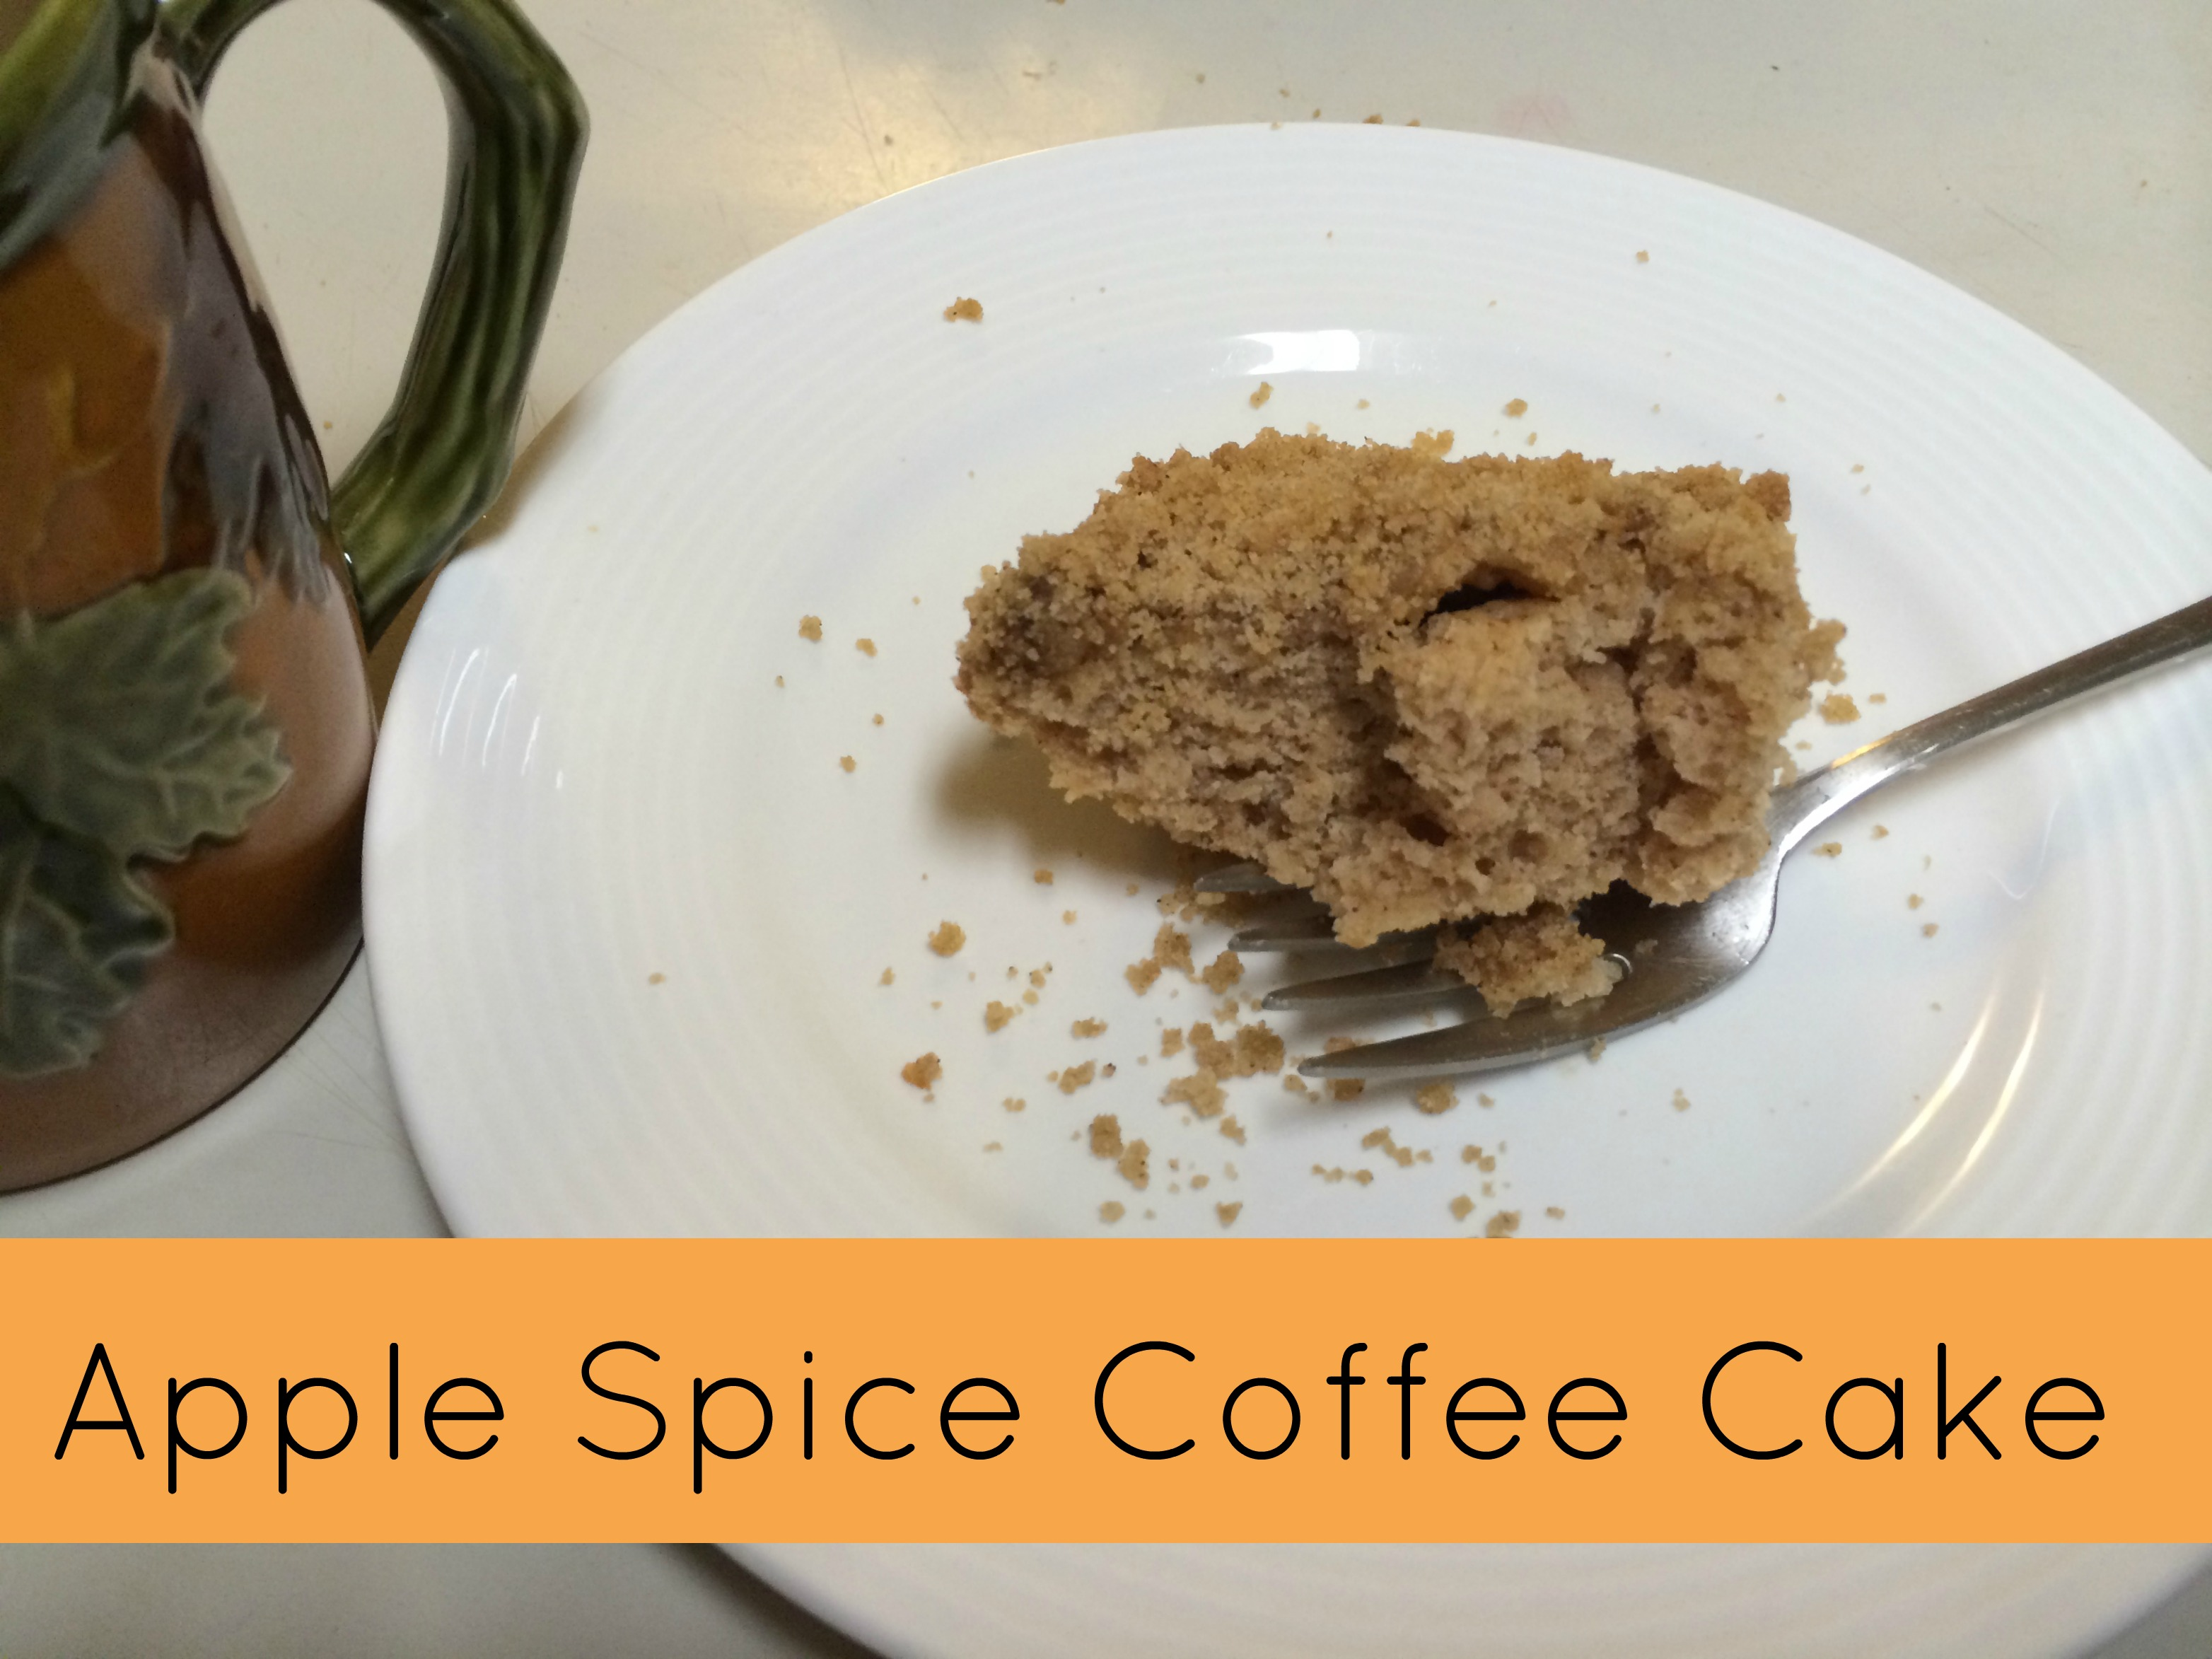 Apple Spice Cake Using Applesauce